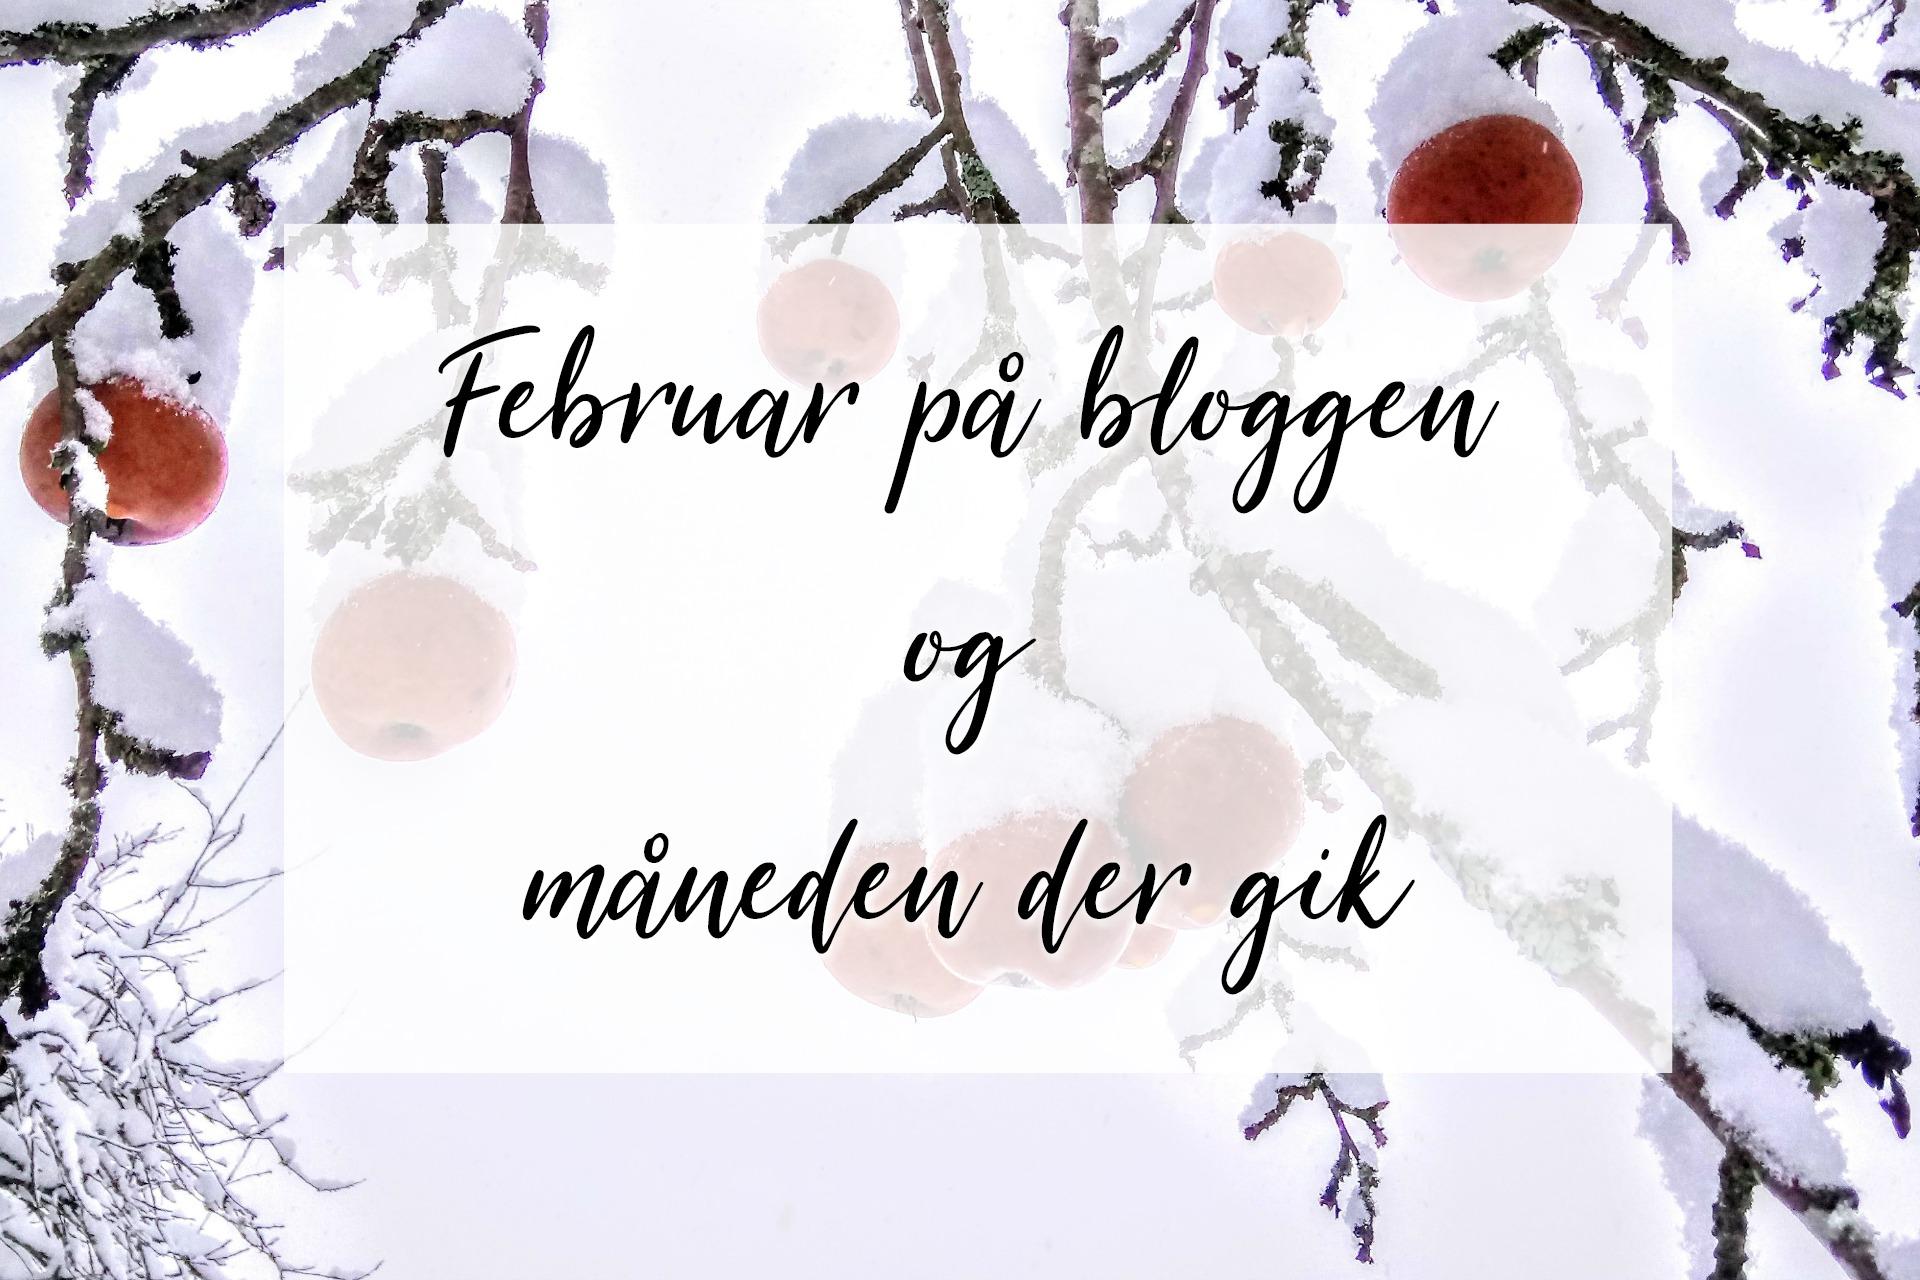 februar-maaned-paa-bloggen-lidt-maaneden-gik